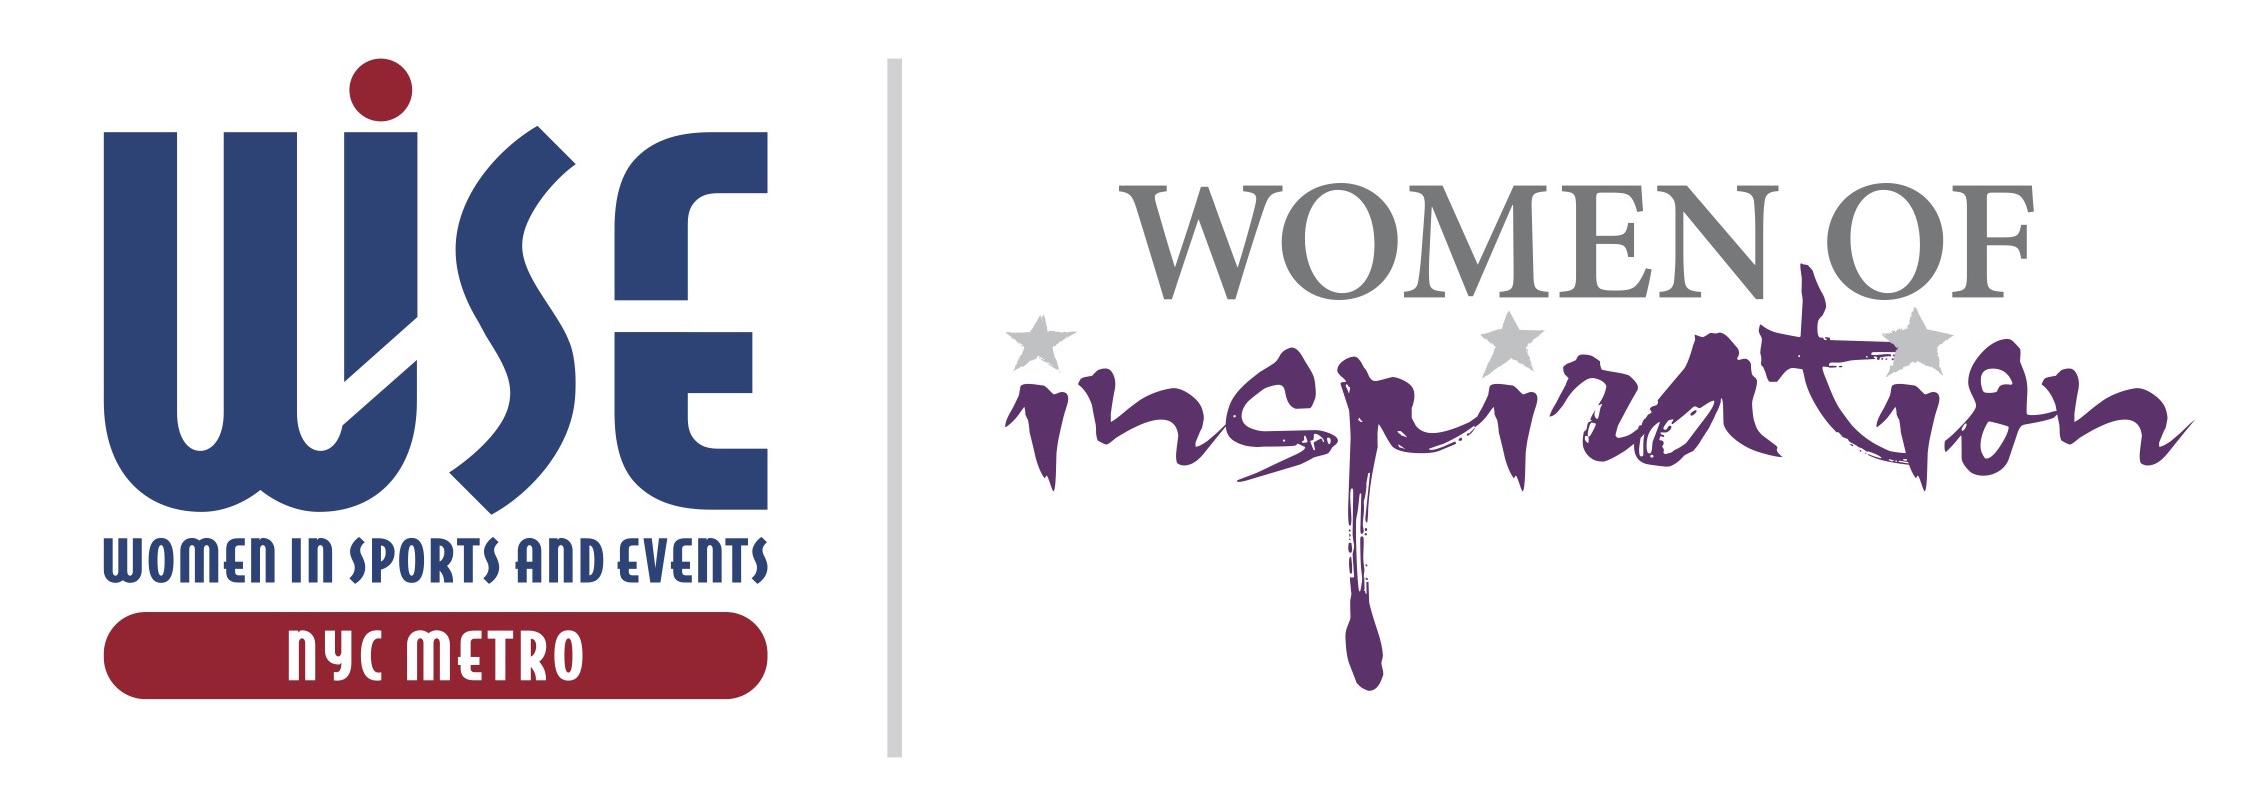 Women of Inspiration